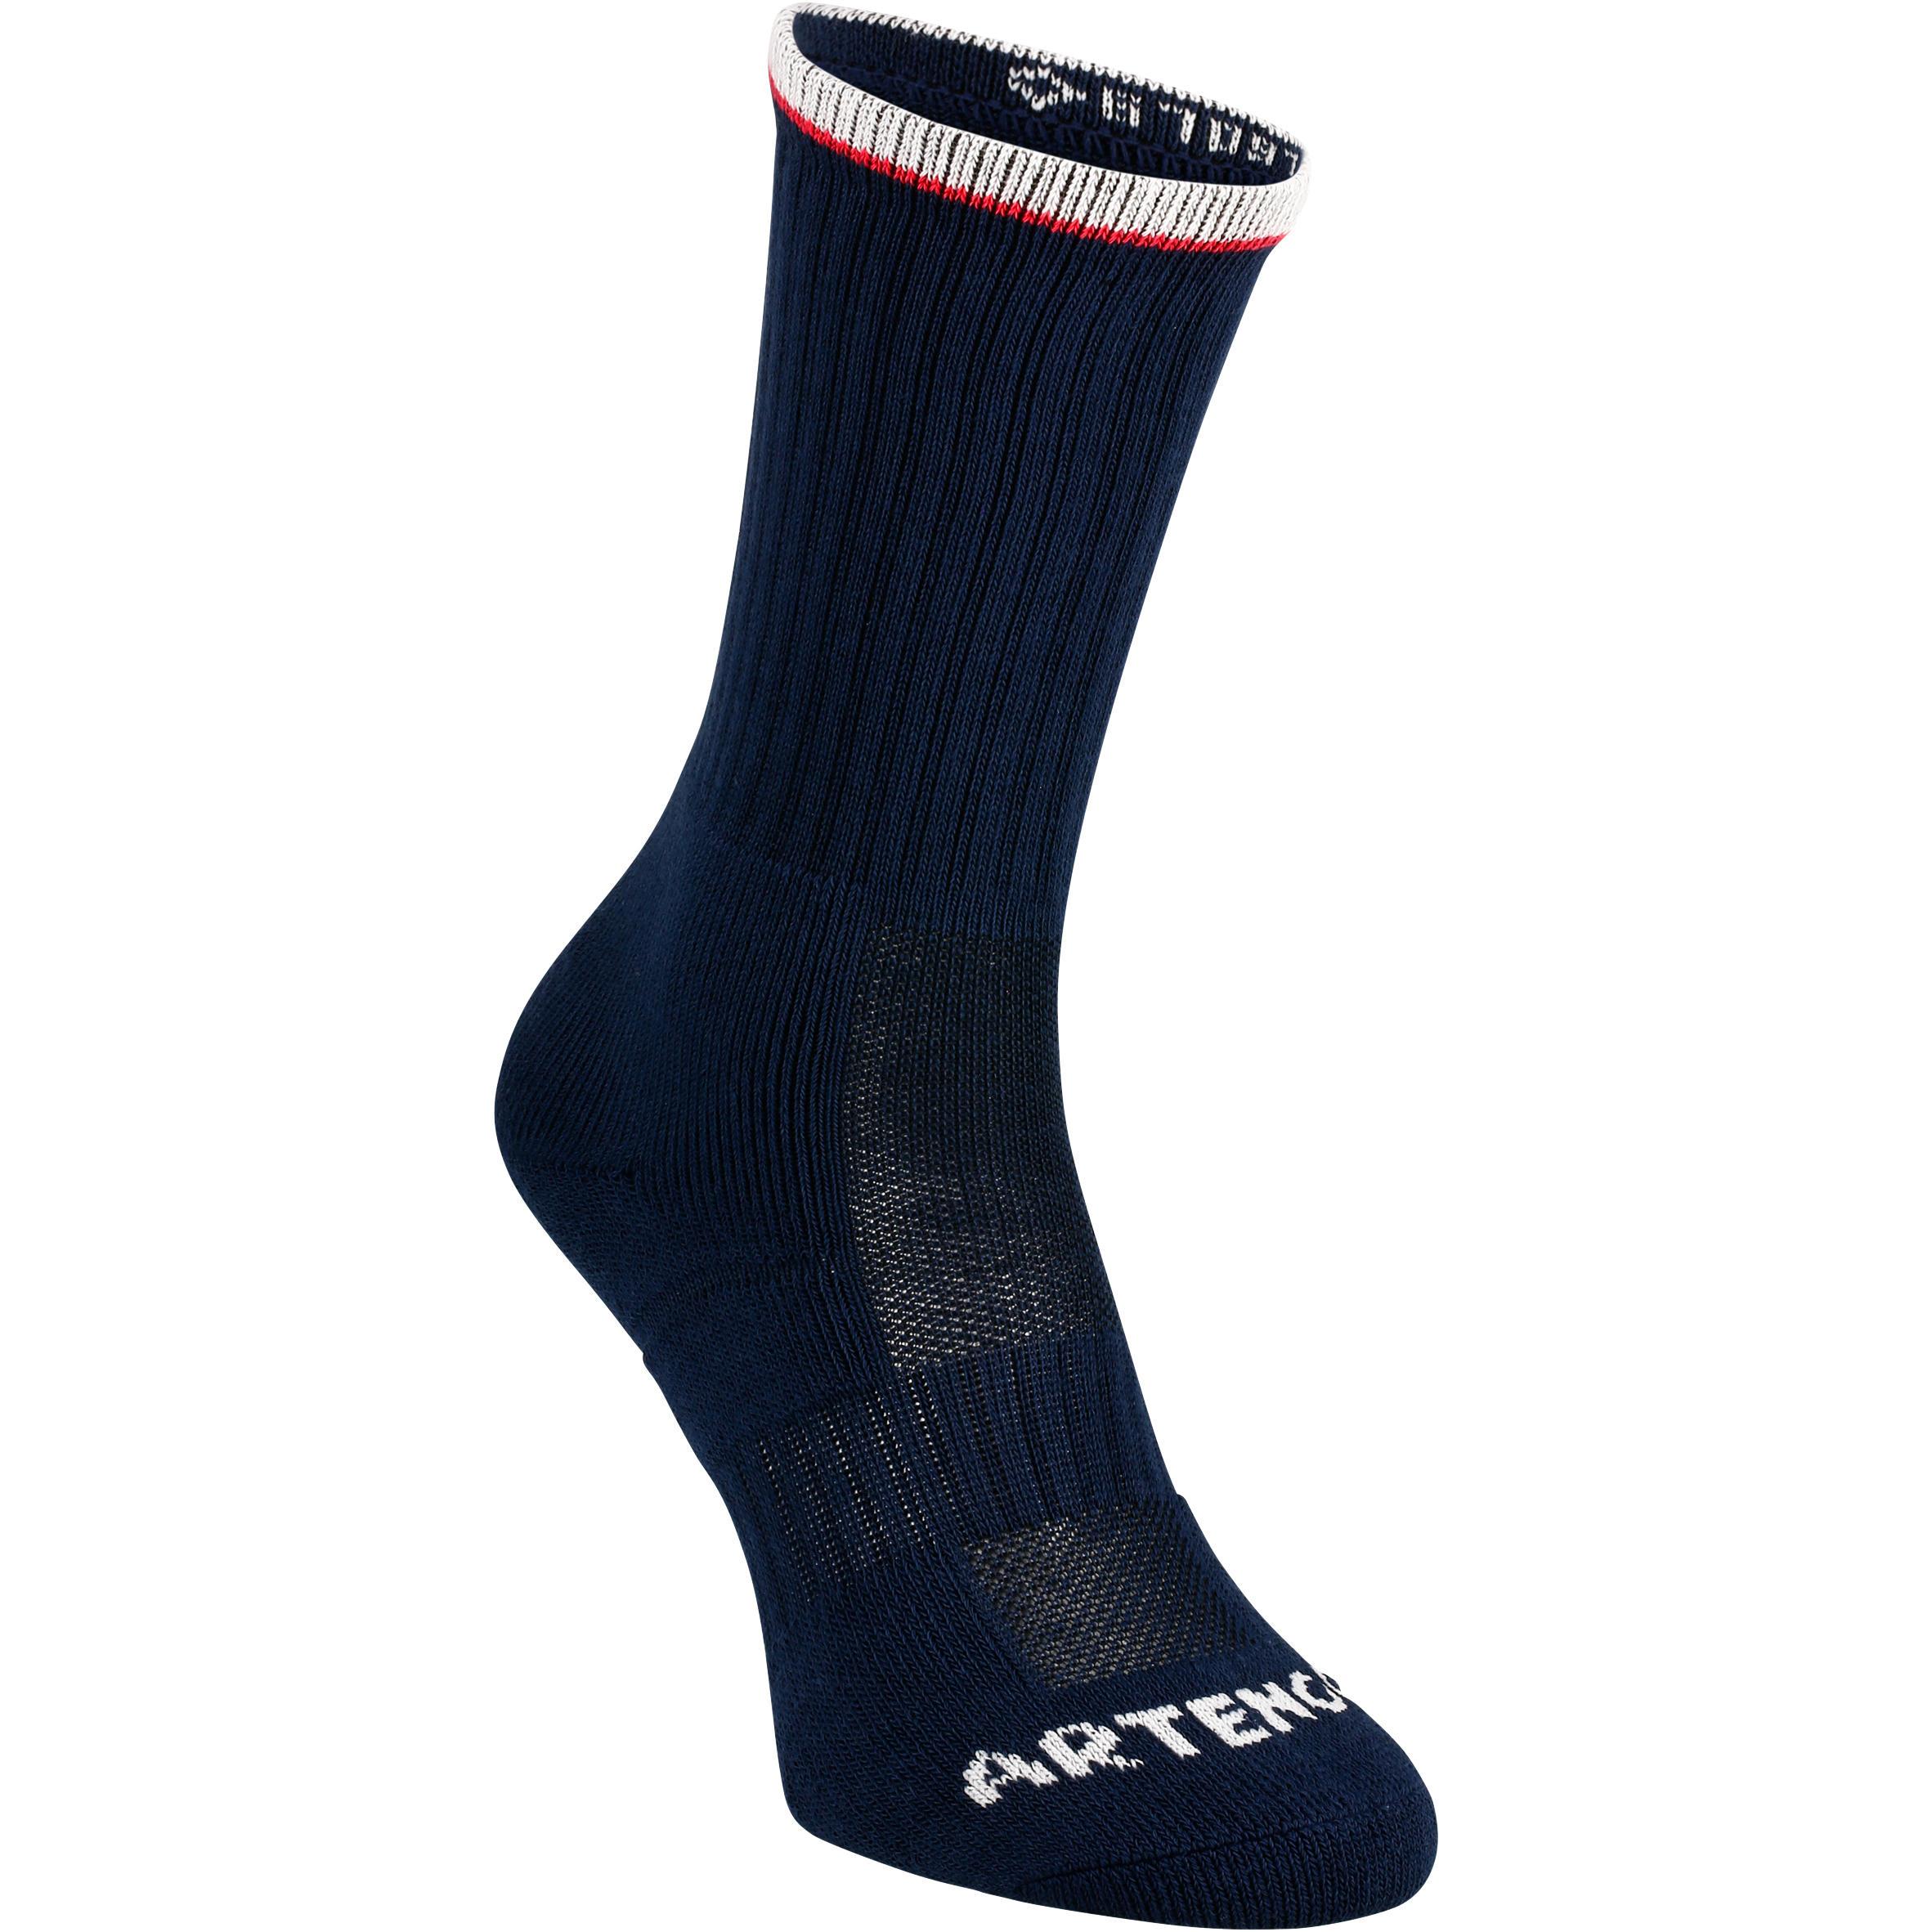 RS500 Adult High Sport Socks Tri-Pack - Blue/Red